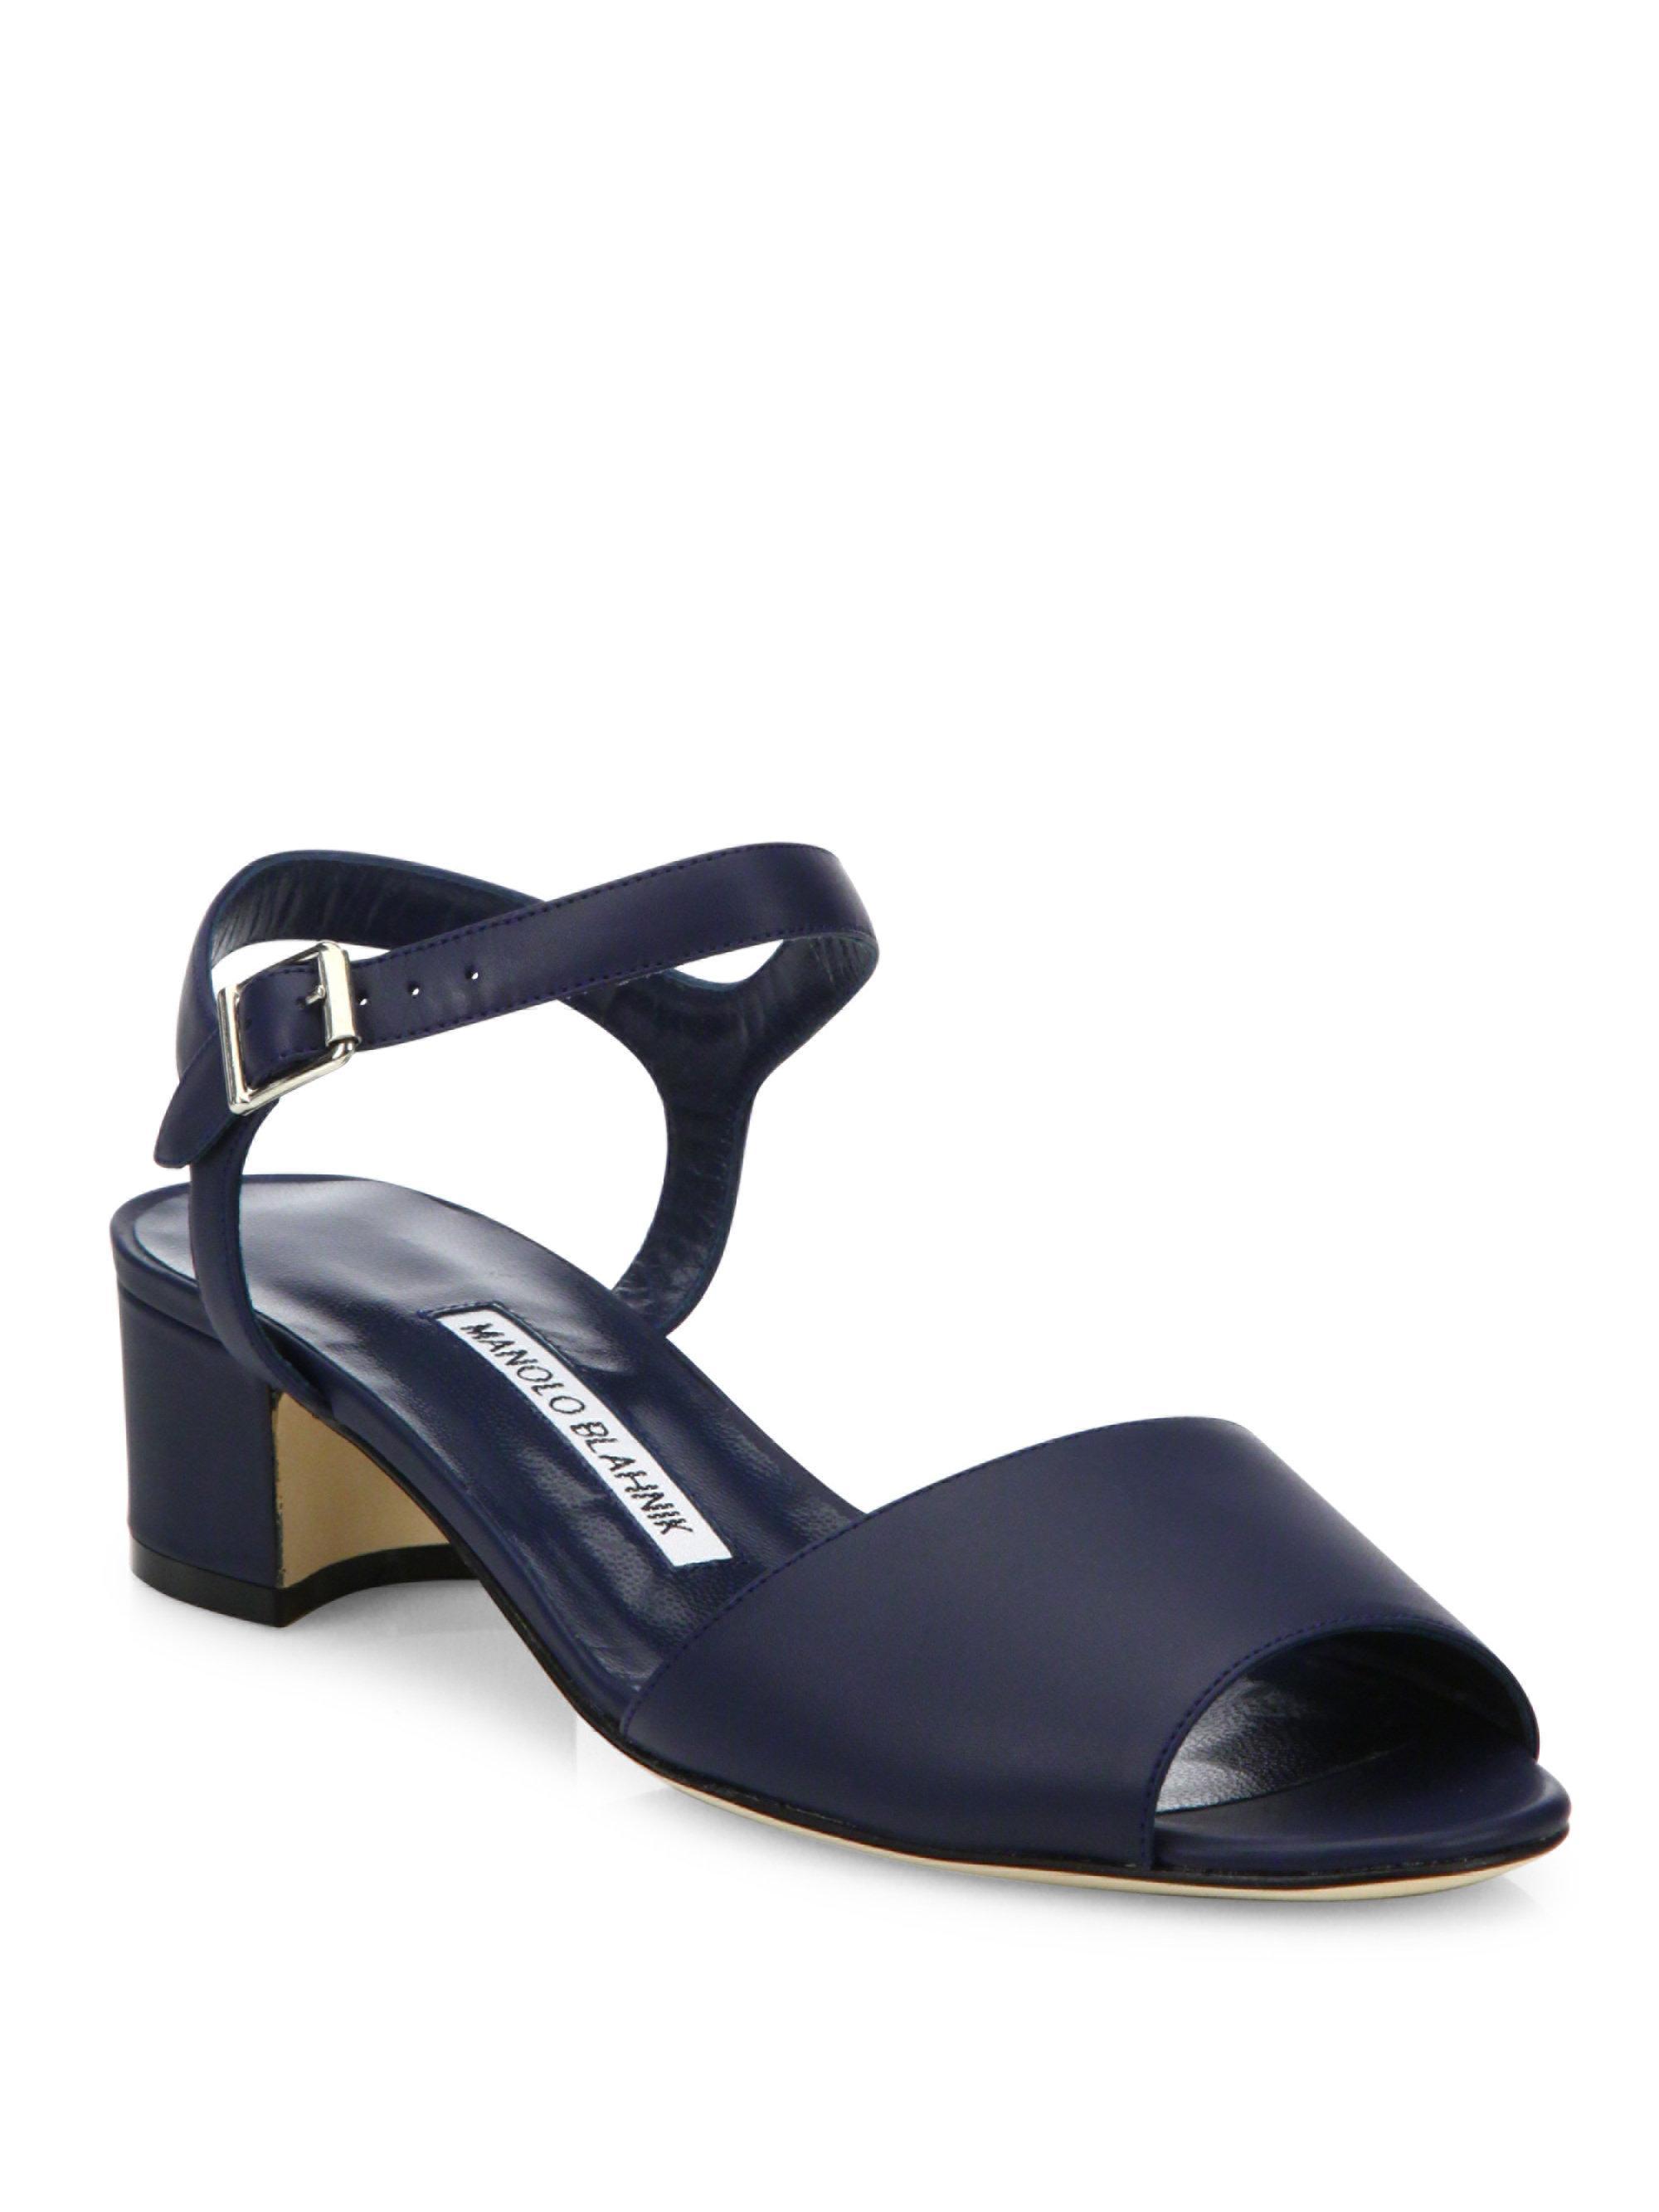 Lyst Manolo Blahnik Affian Leather Ankle Strap Block